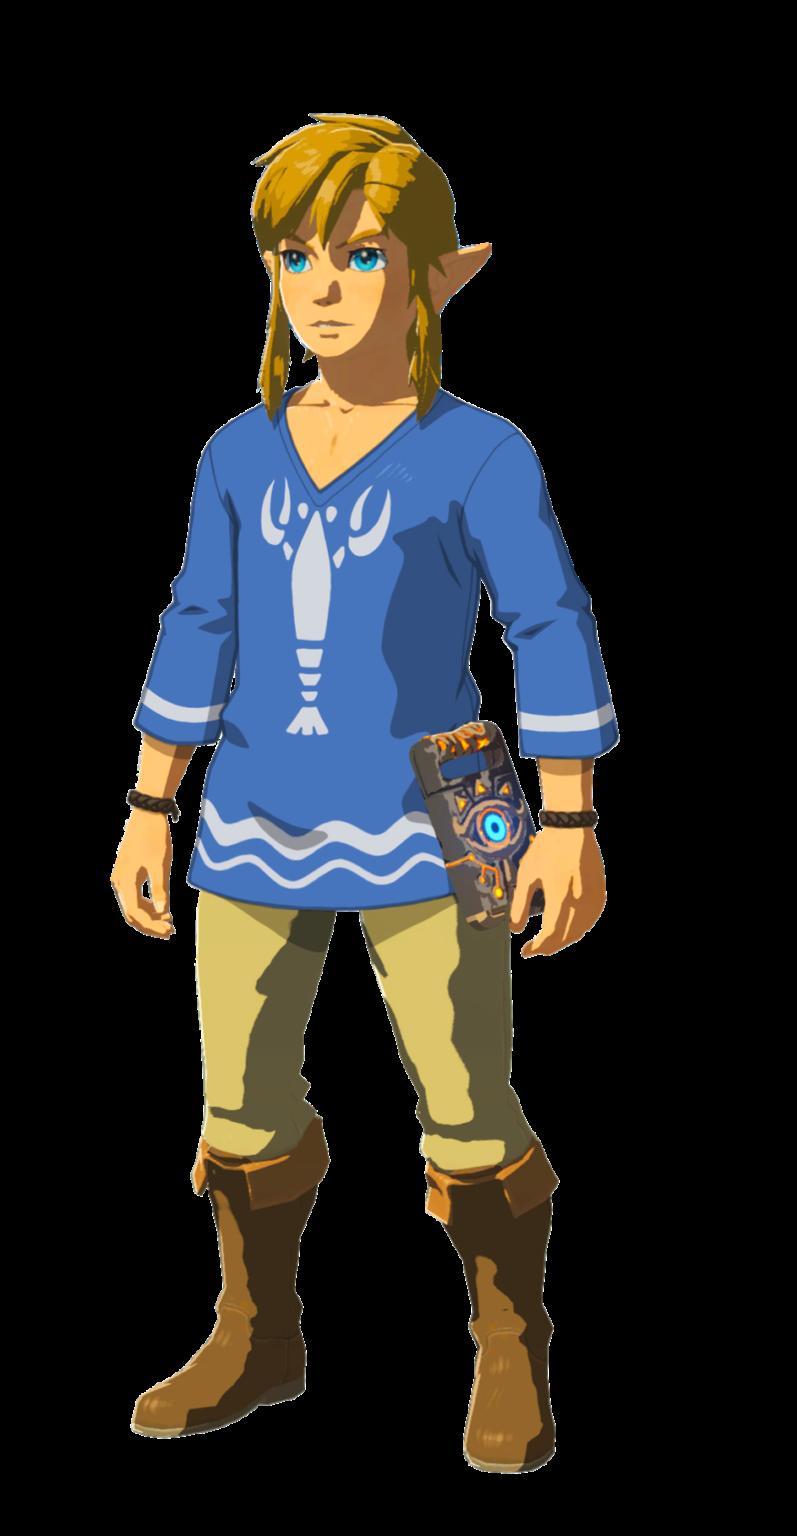 BOTW Link in 2020 Breath of the wild, Zelda hyrule